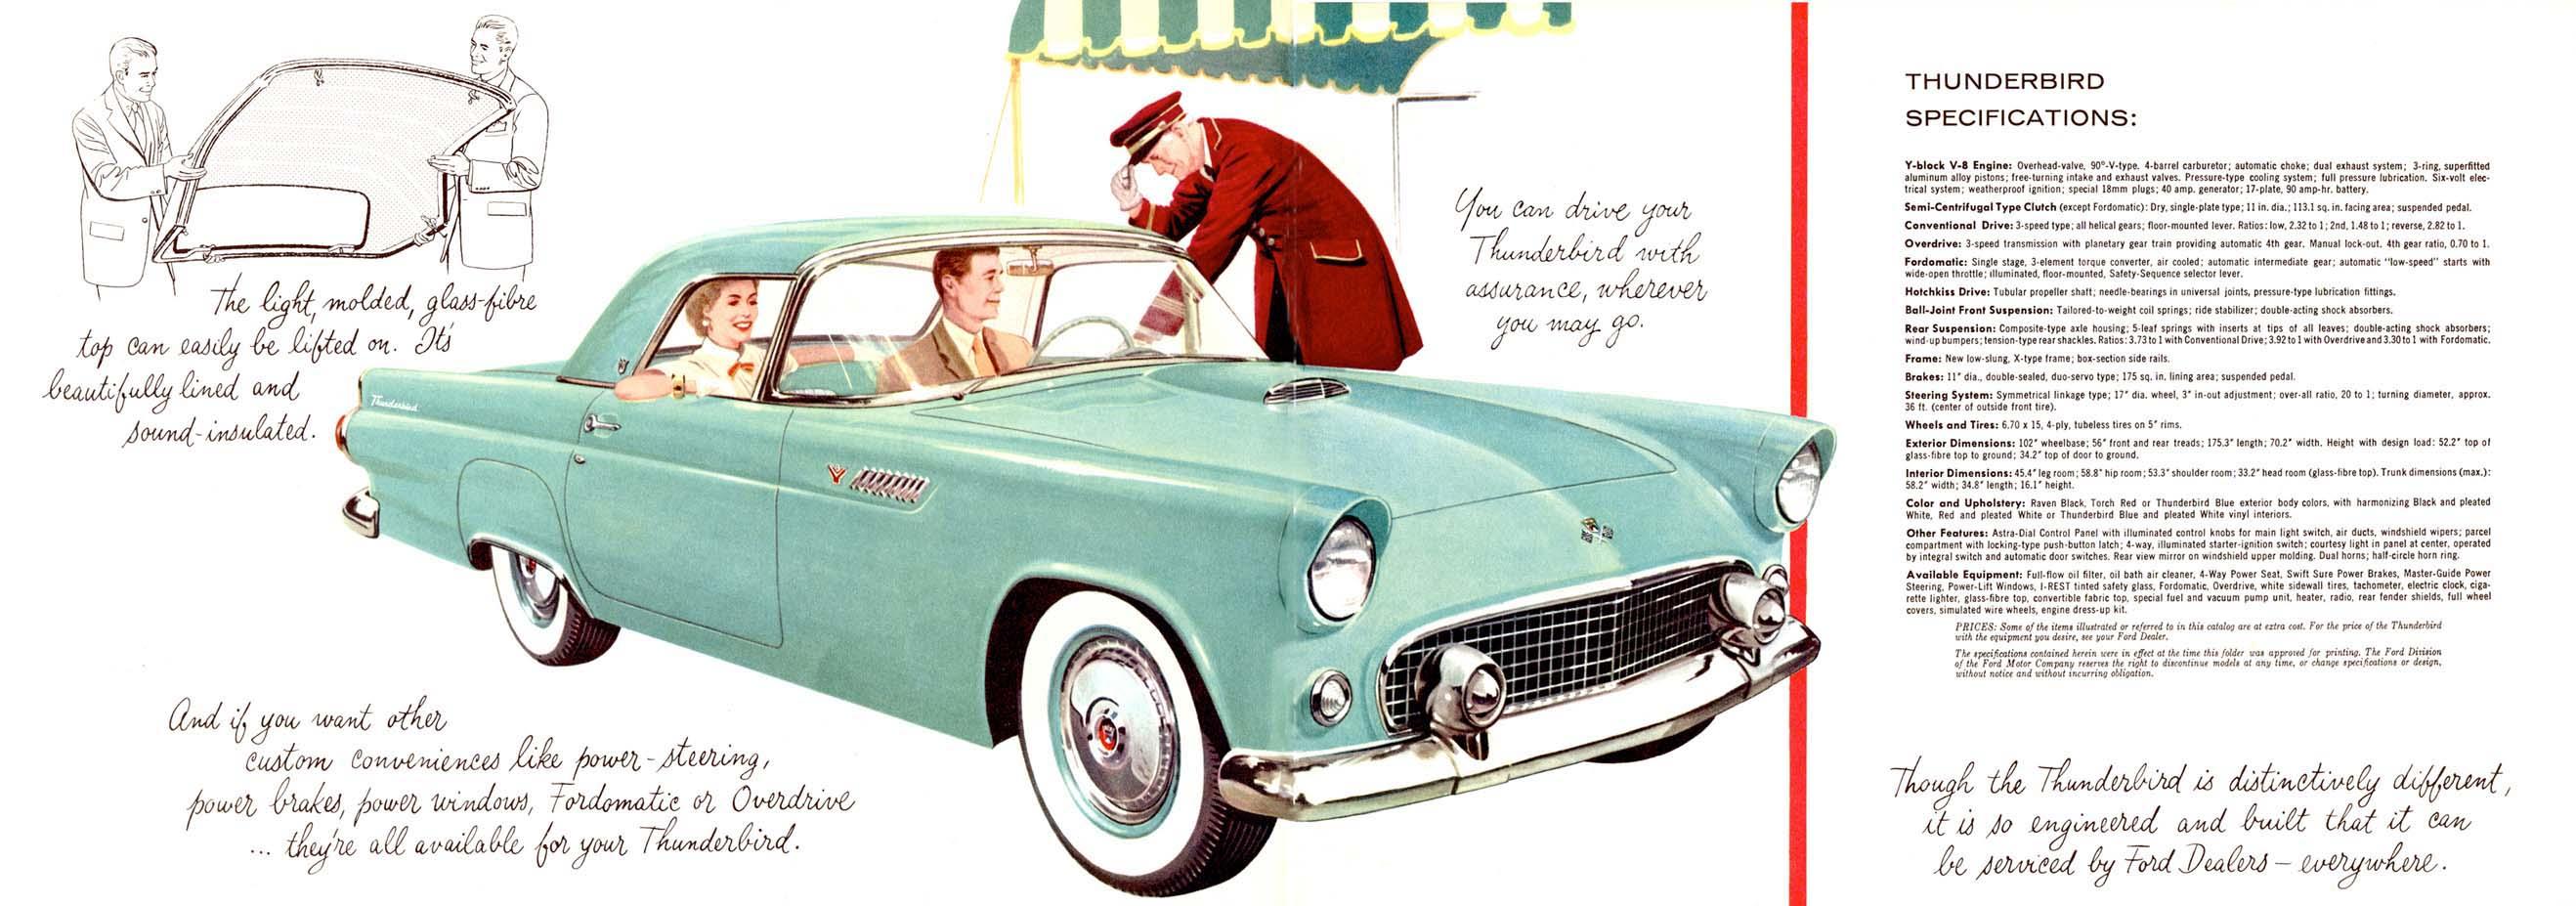 Project Car Insurance